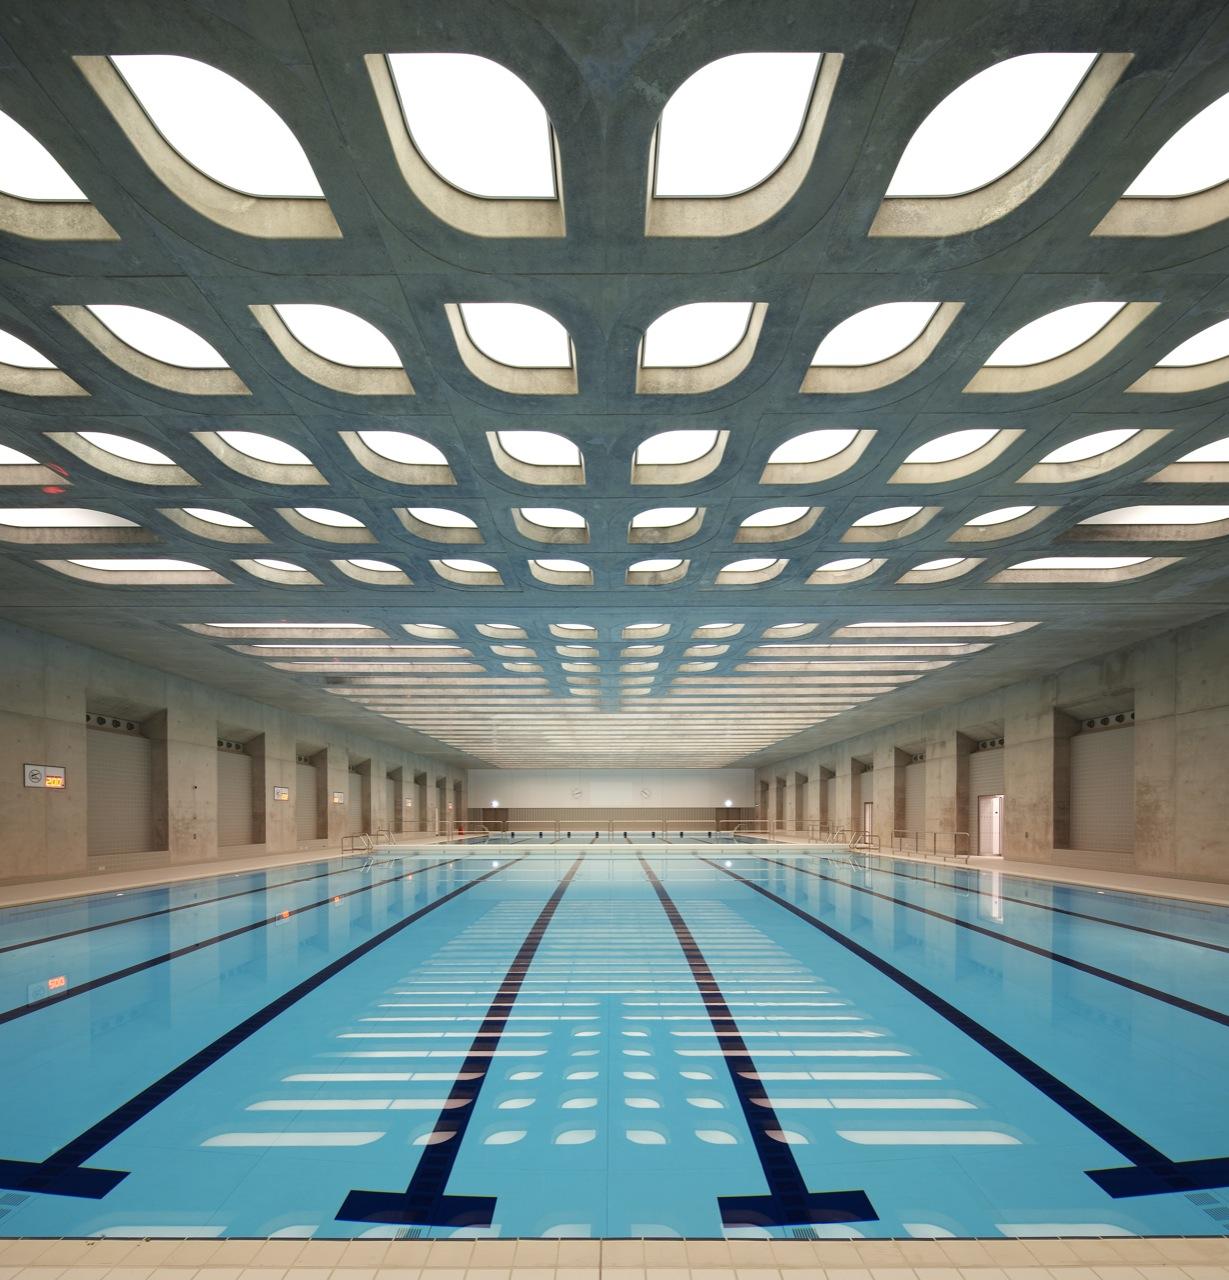 Centro Aquático dos Jogos Olímpicos de Londres 2012 / Zaha Hadid Architects, © Hufton + Crow